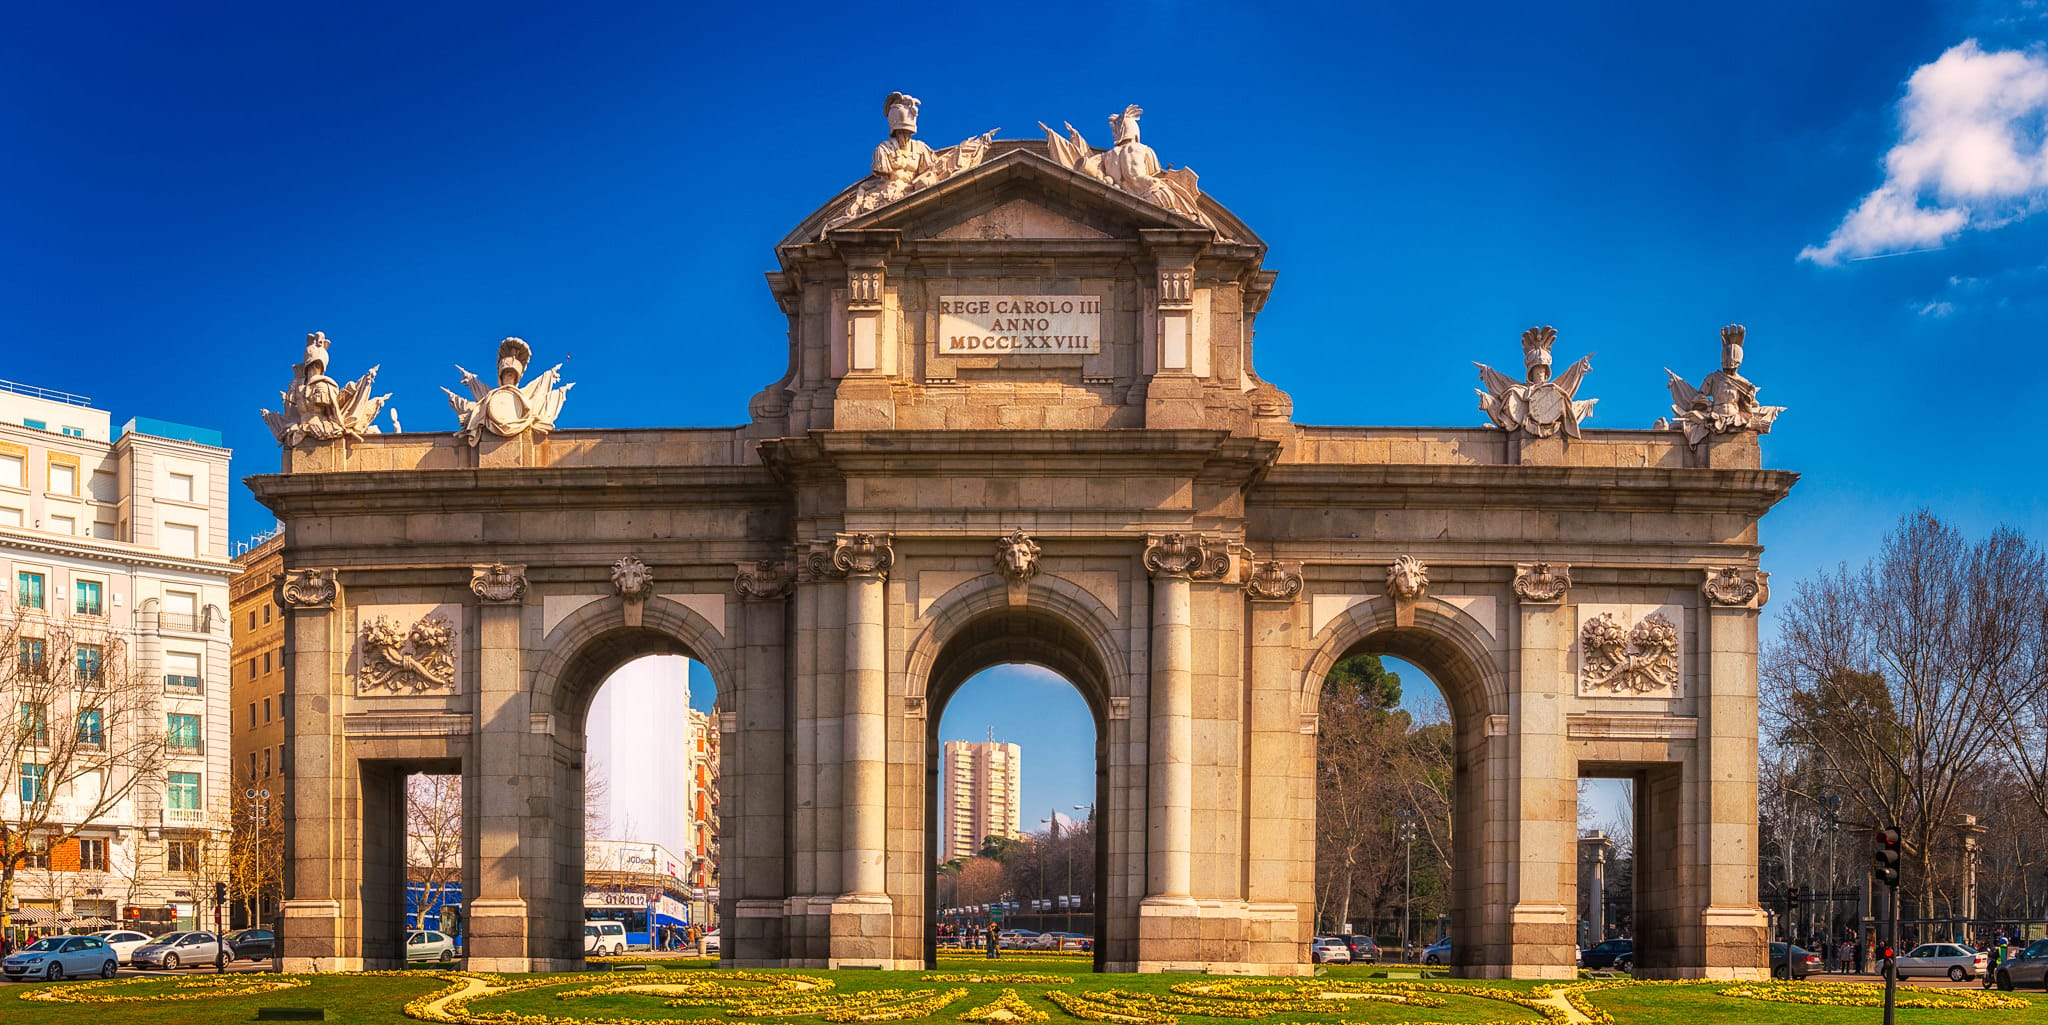 Puerta De Alcal 225 Madrid Spain Sumfinity